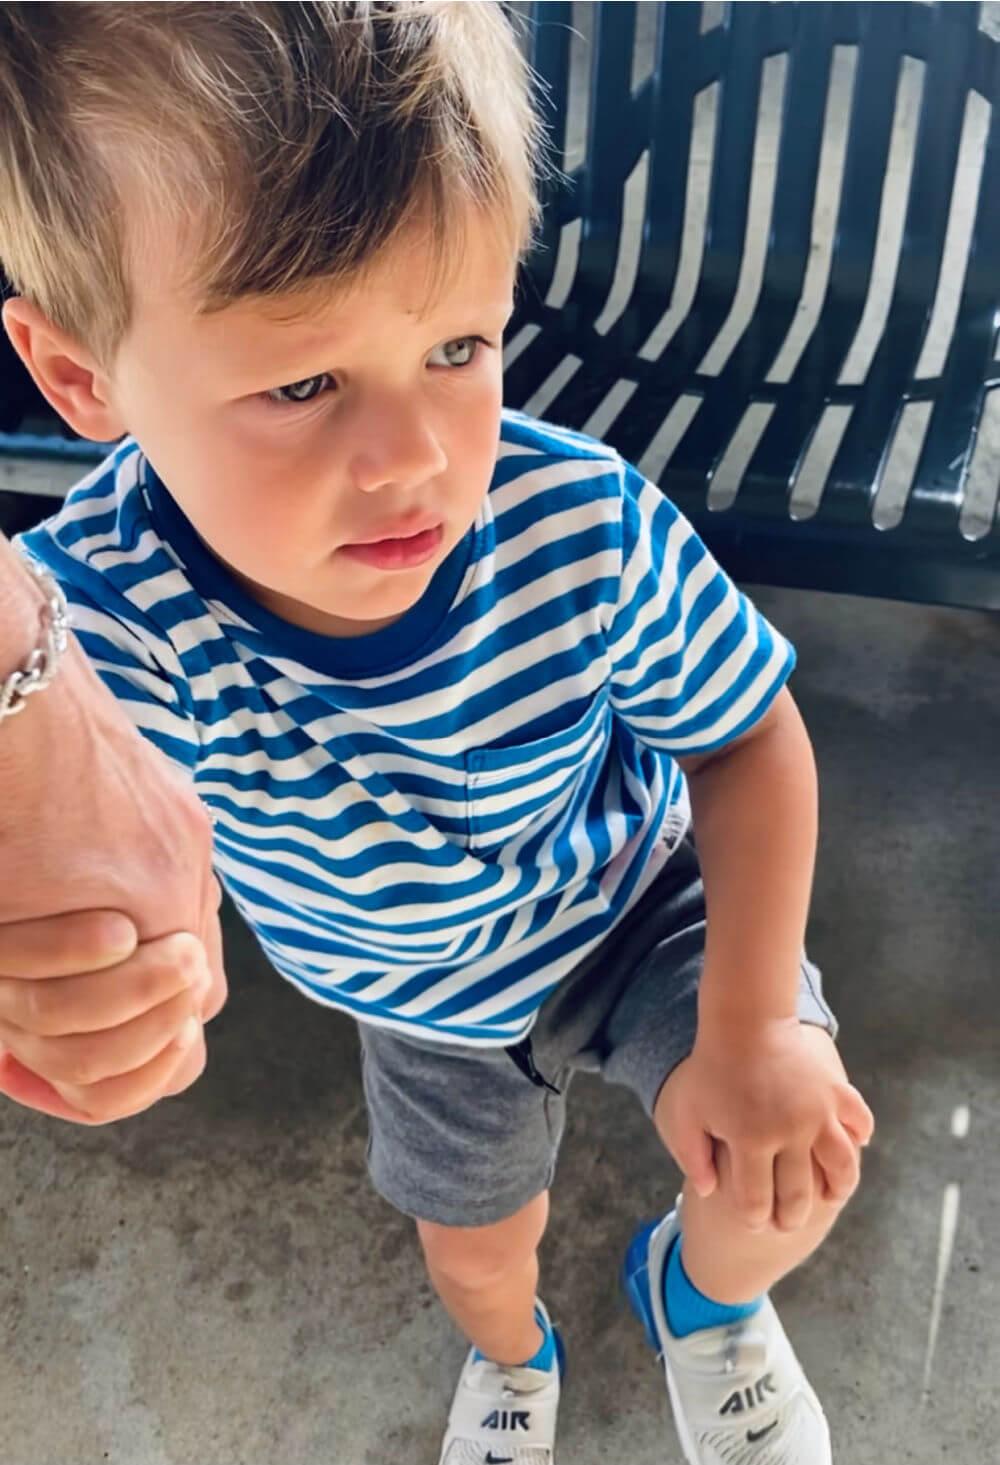 transient synovitis toddler